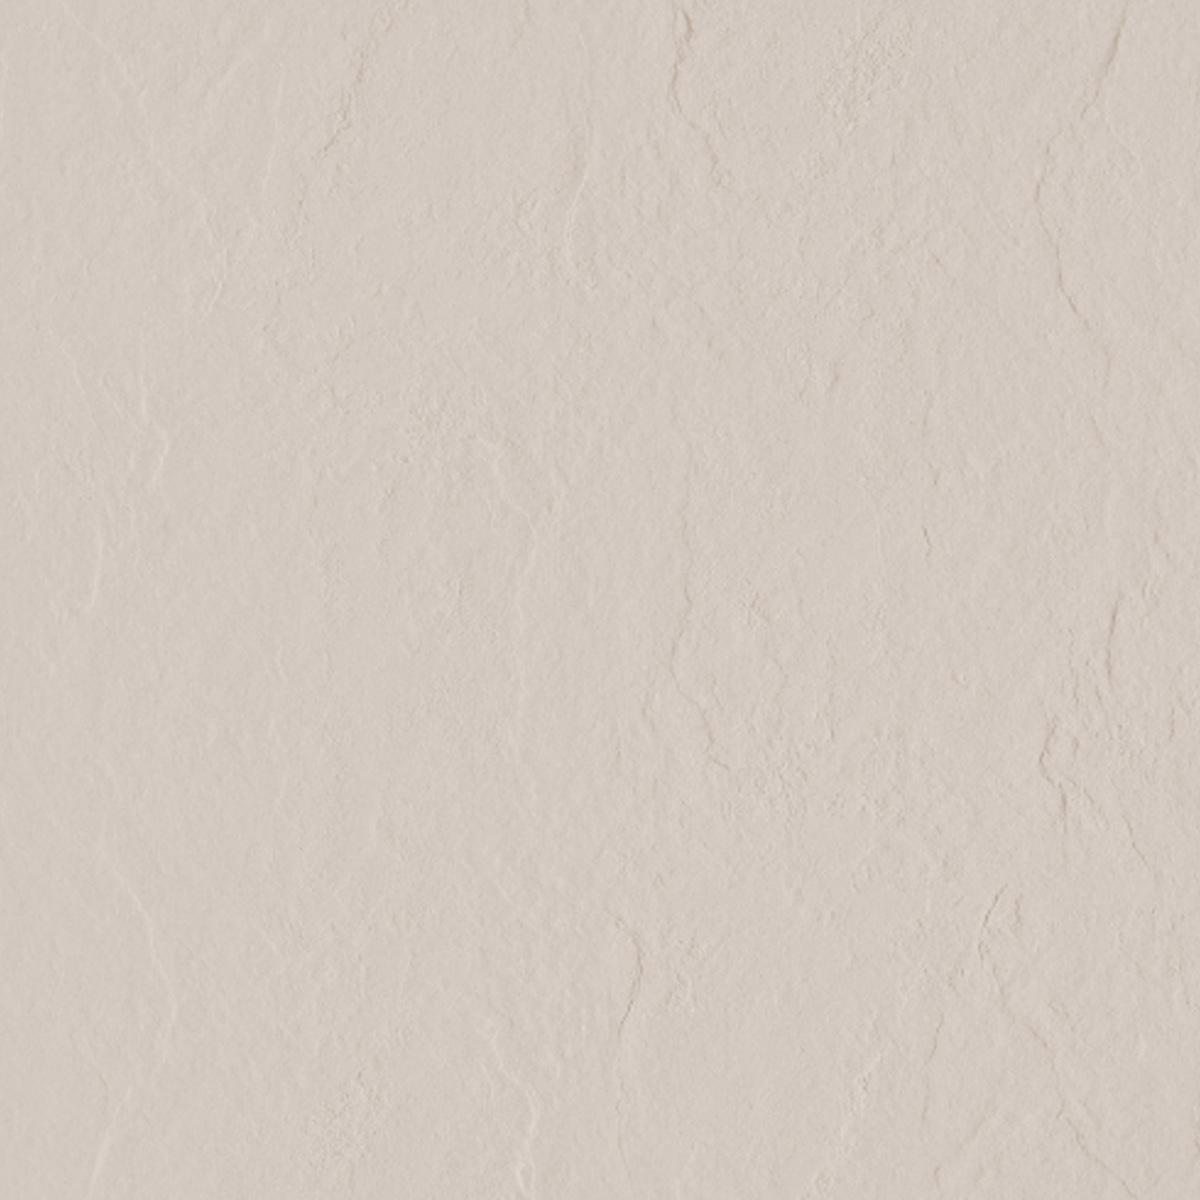 Tiles - PURE - Textured Beige 300x600mm (8 pieces)